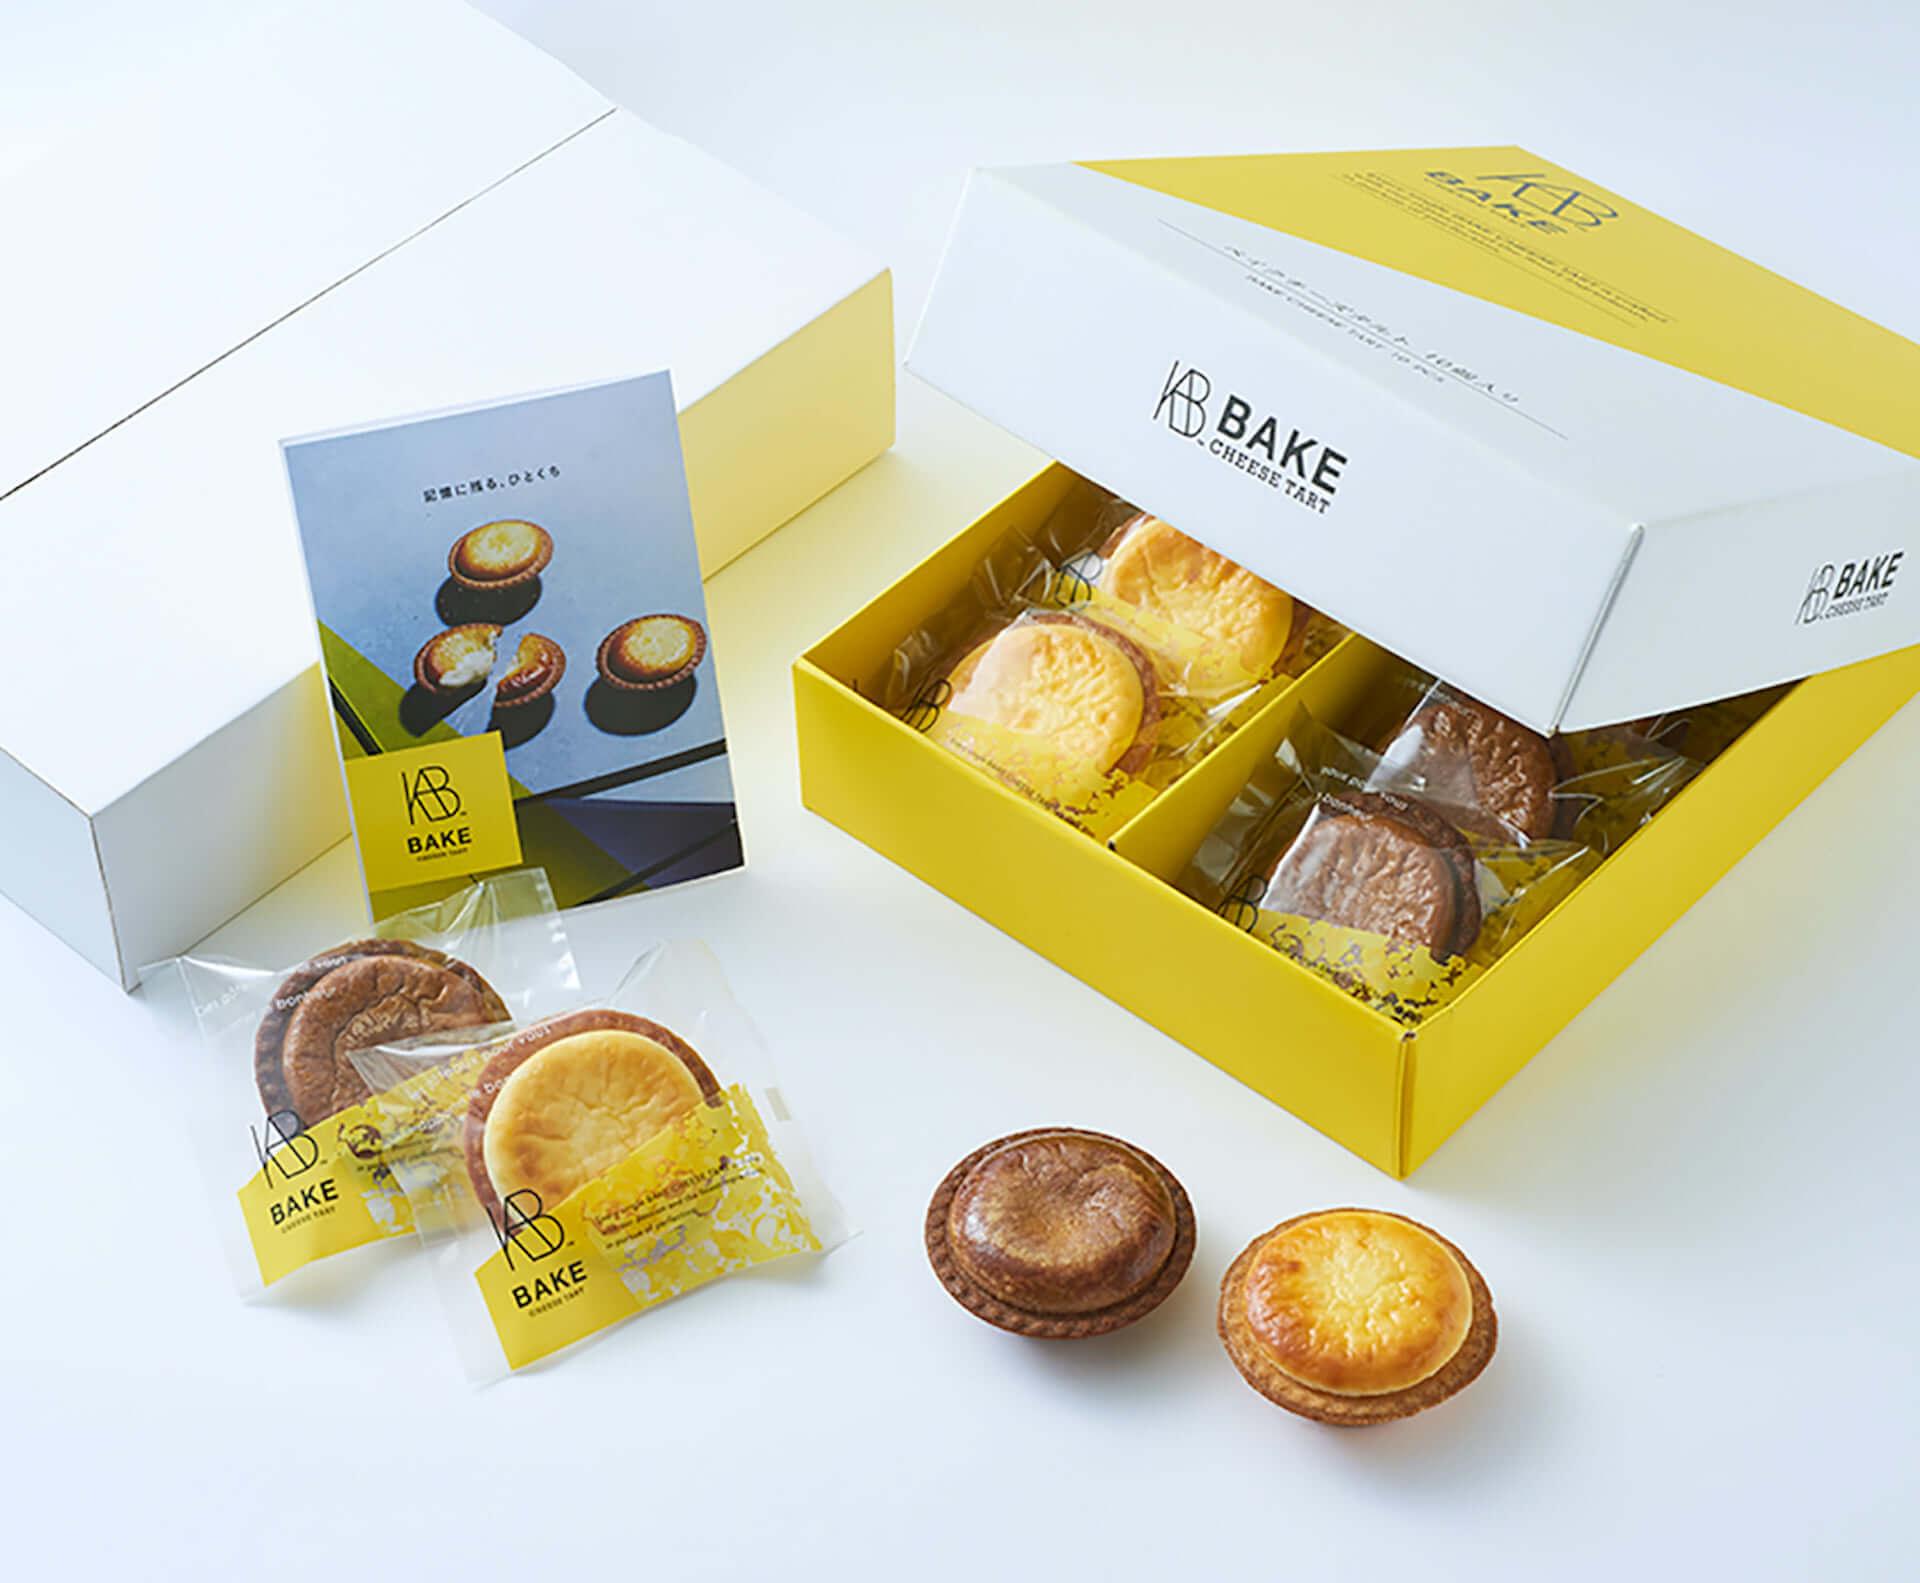 BAKE初の公式オンラインショップ「BAKE THE ONLINE」がオープン!チーズタルト10P BOXが50%OFFの特別価格に gourmet_bake_online_01-1920x1583